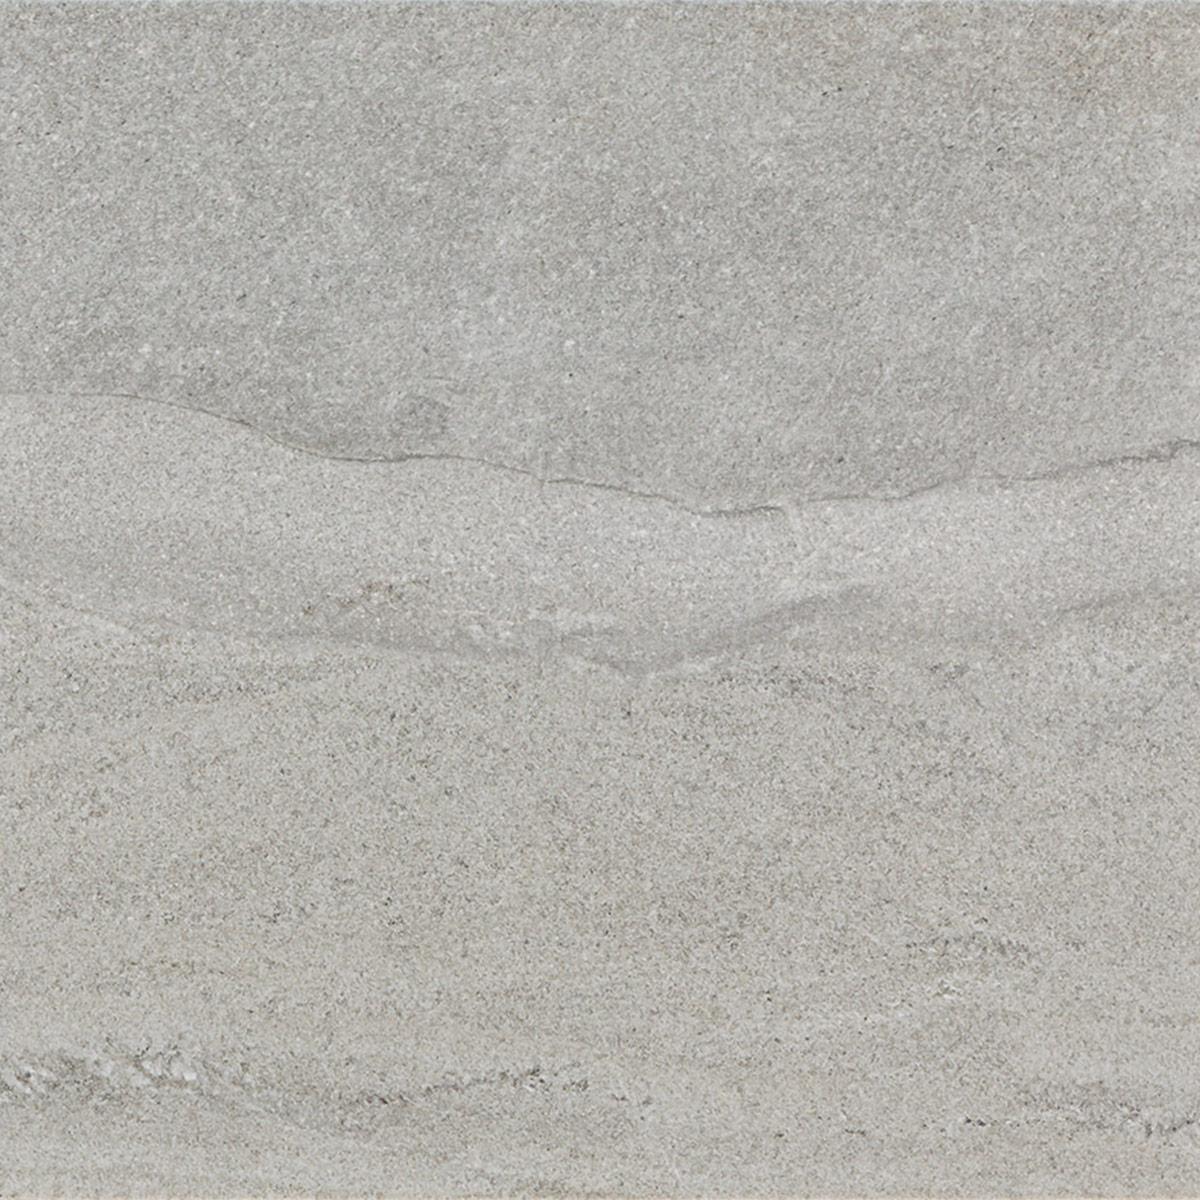 WHITEHALL PEARL 24X24 GLOSSY P1